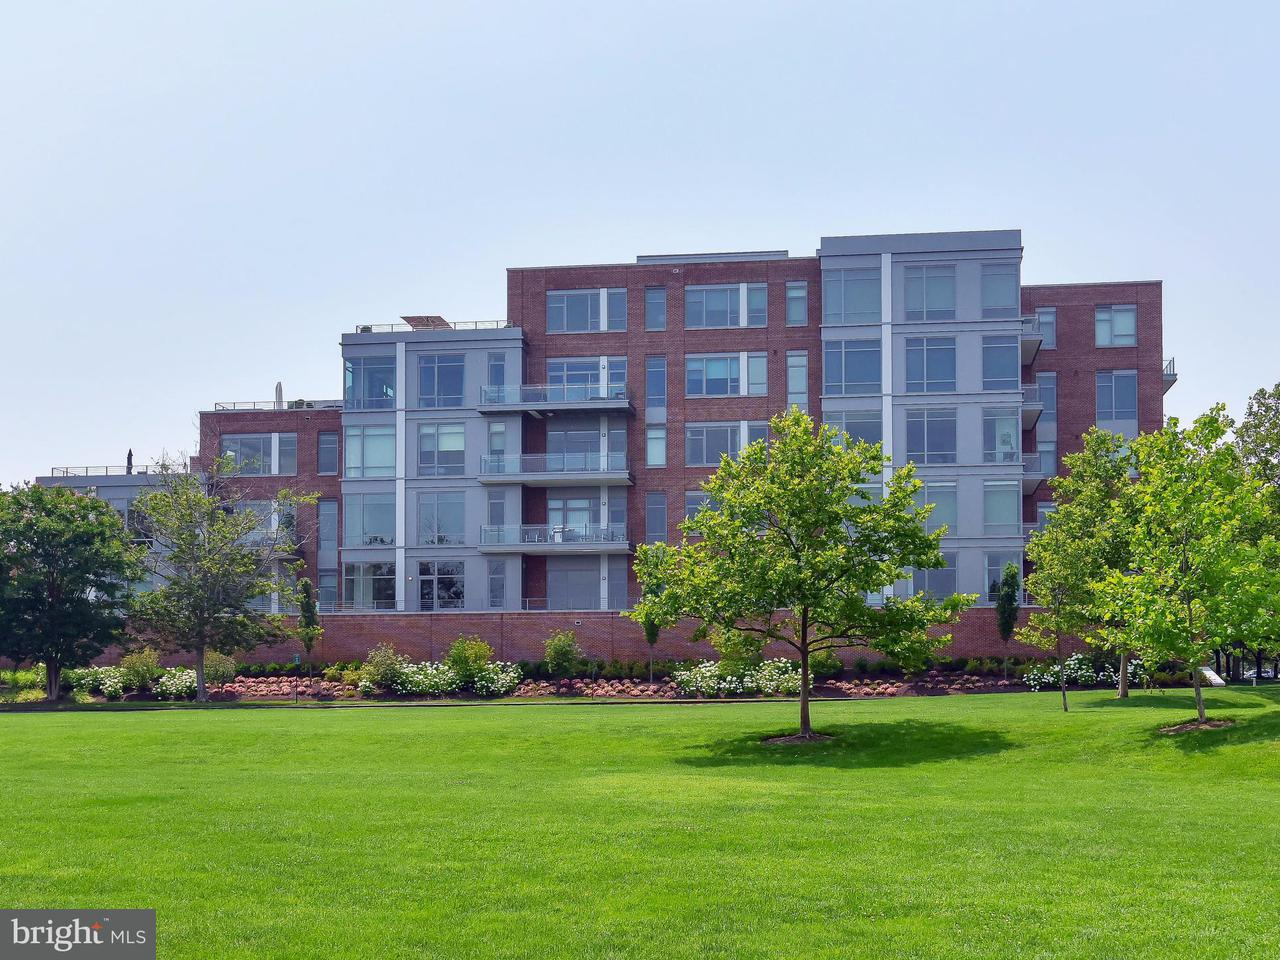 Condominium for Sale at 601 N Fairfax St #216 601 N Fairfax St #216 Alexandria, Virginia 22314 United States